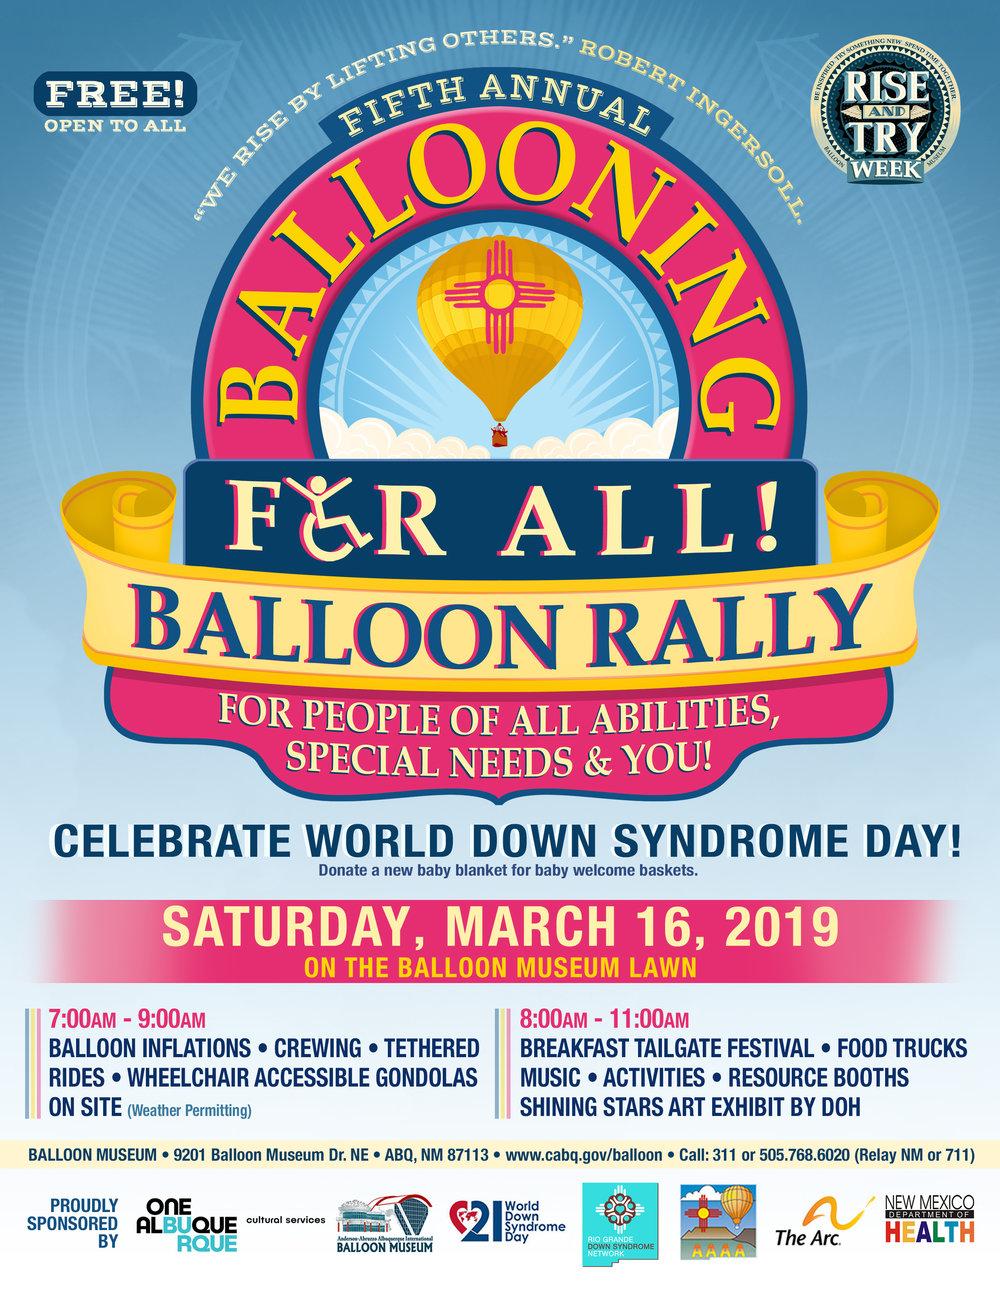 Ballooning For All Day Flyer 2019.jpg